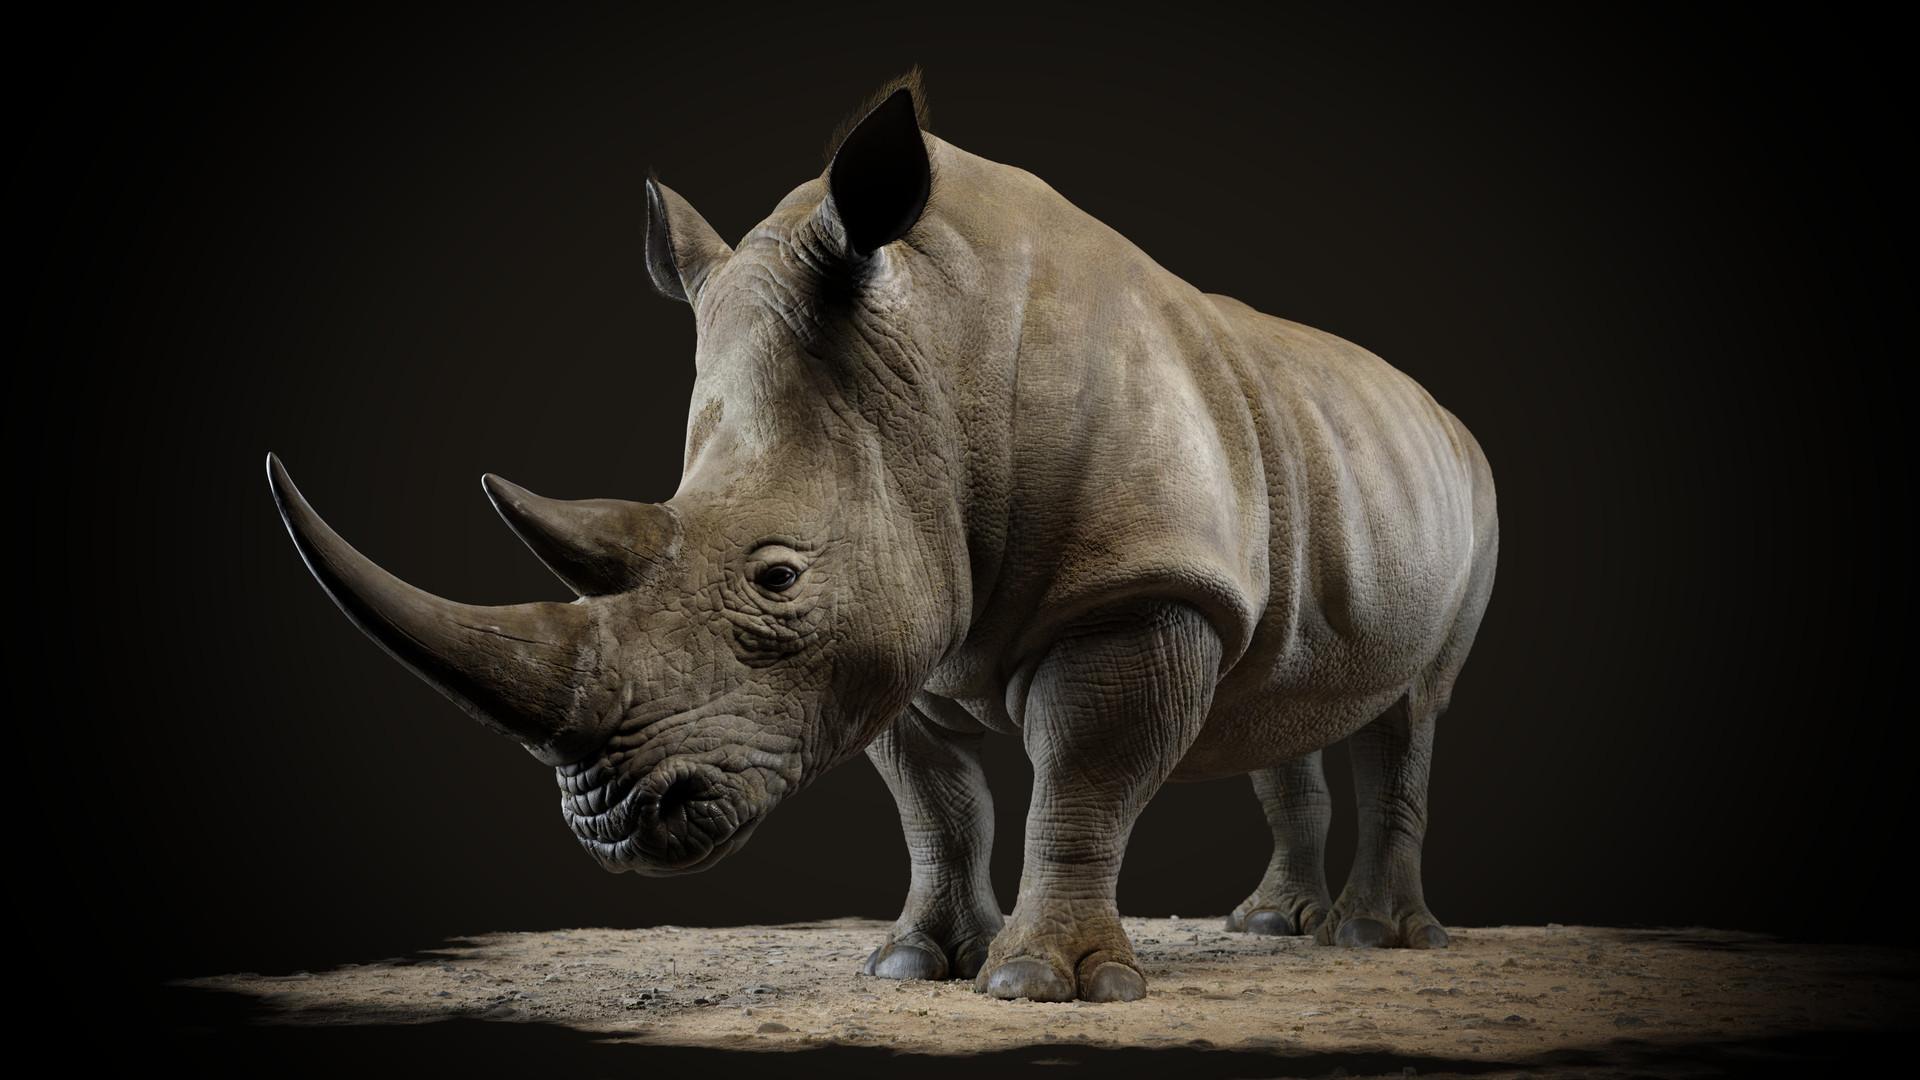 Patrick Danneker White Rhinoceros